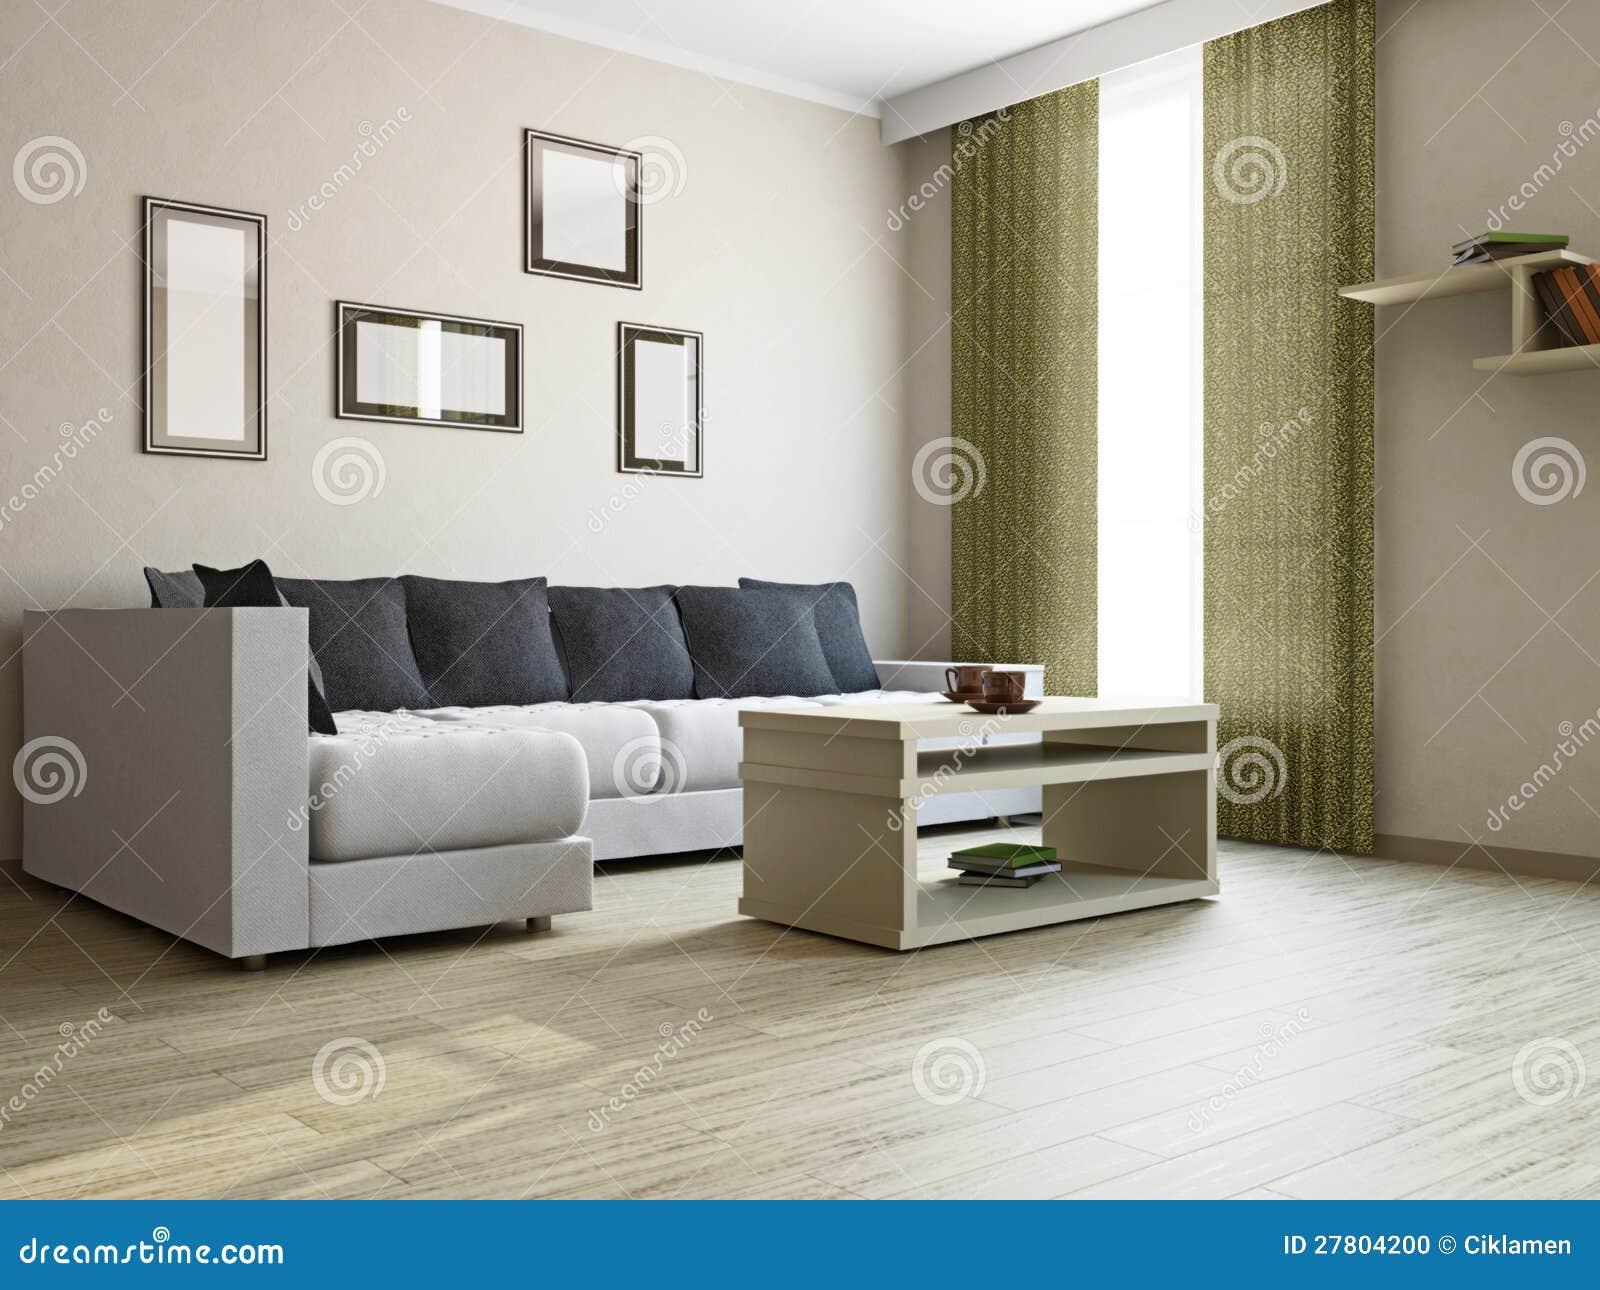 Kleine woonkamer inspiratie - Deco grote woonkamer ...